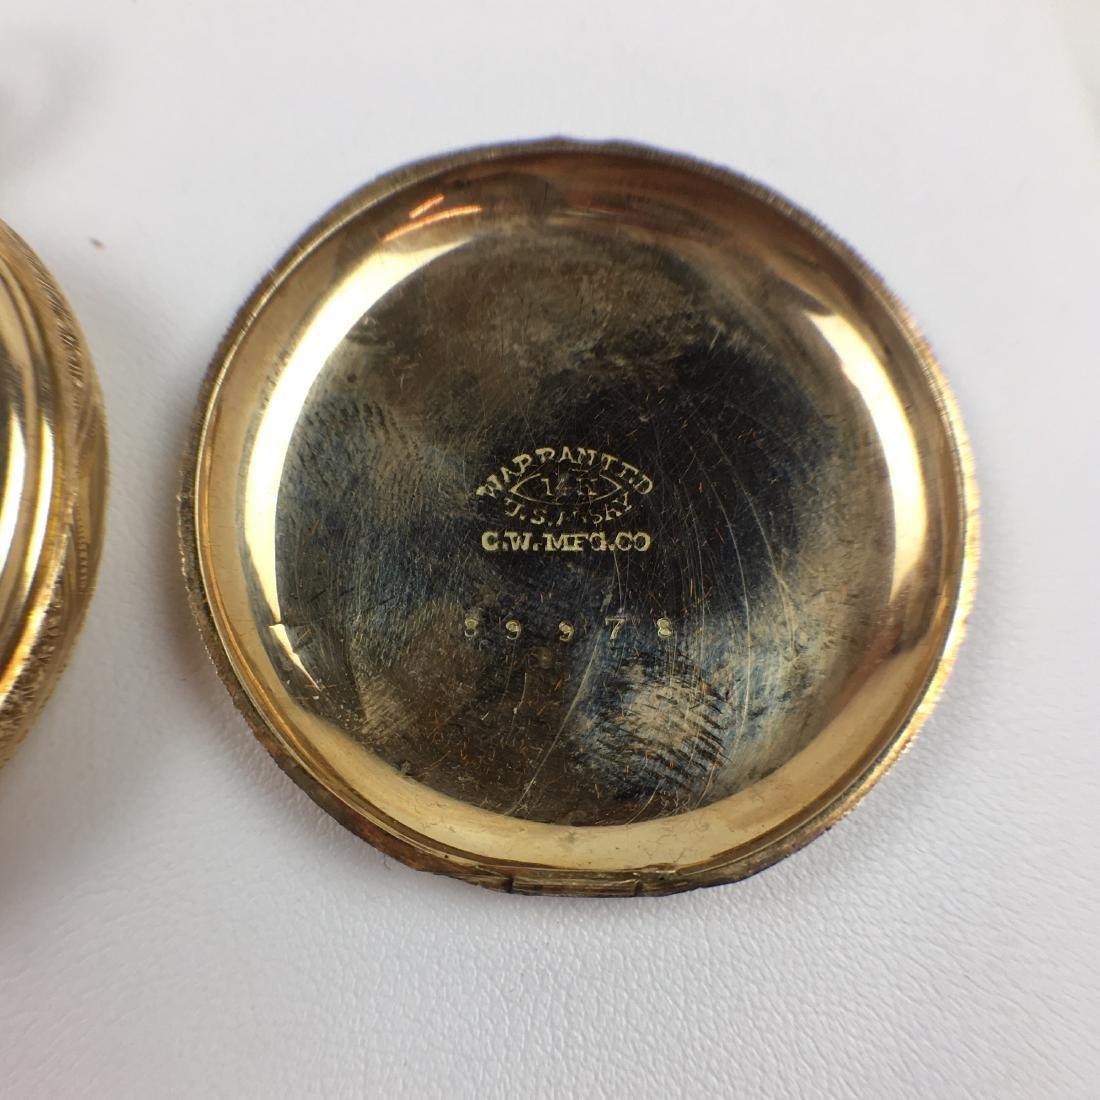 ANTIQUE 14K YELLOW GOLD ELGIN POCKET WATCH - 7